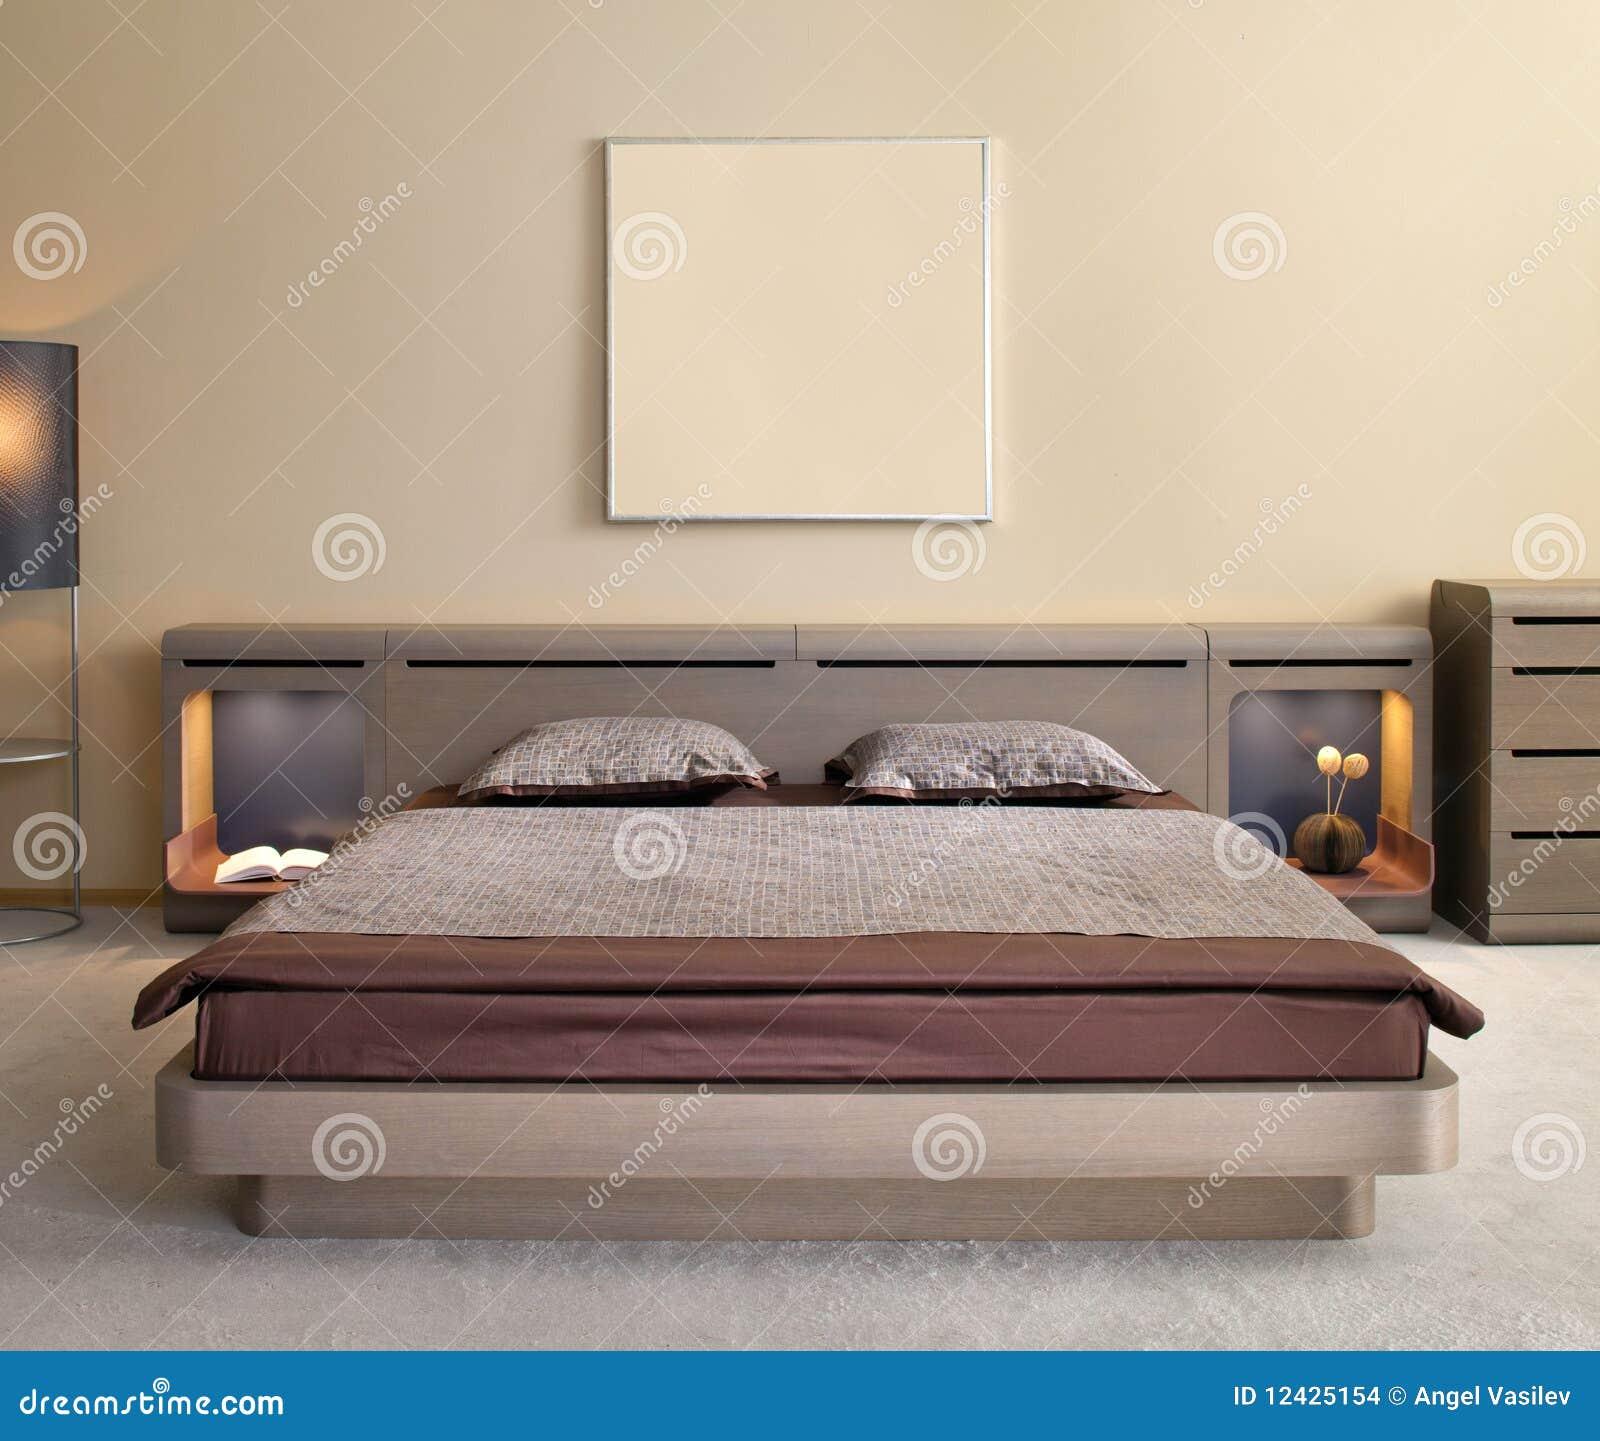 Mooi en modern slaapkamer binnenlands ontwerp. stock afbeeldingen ...